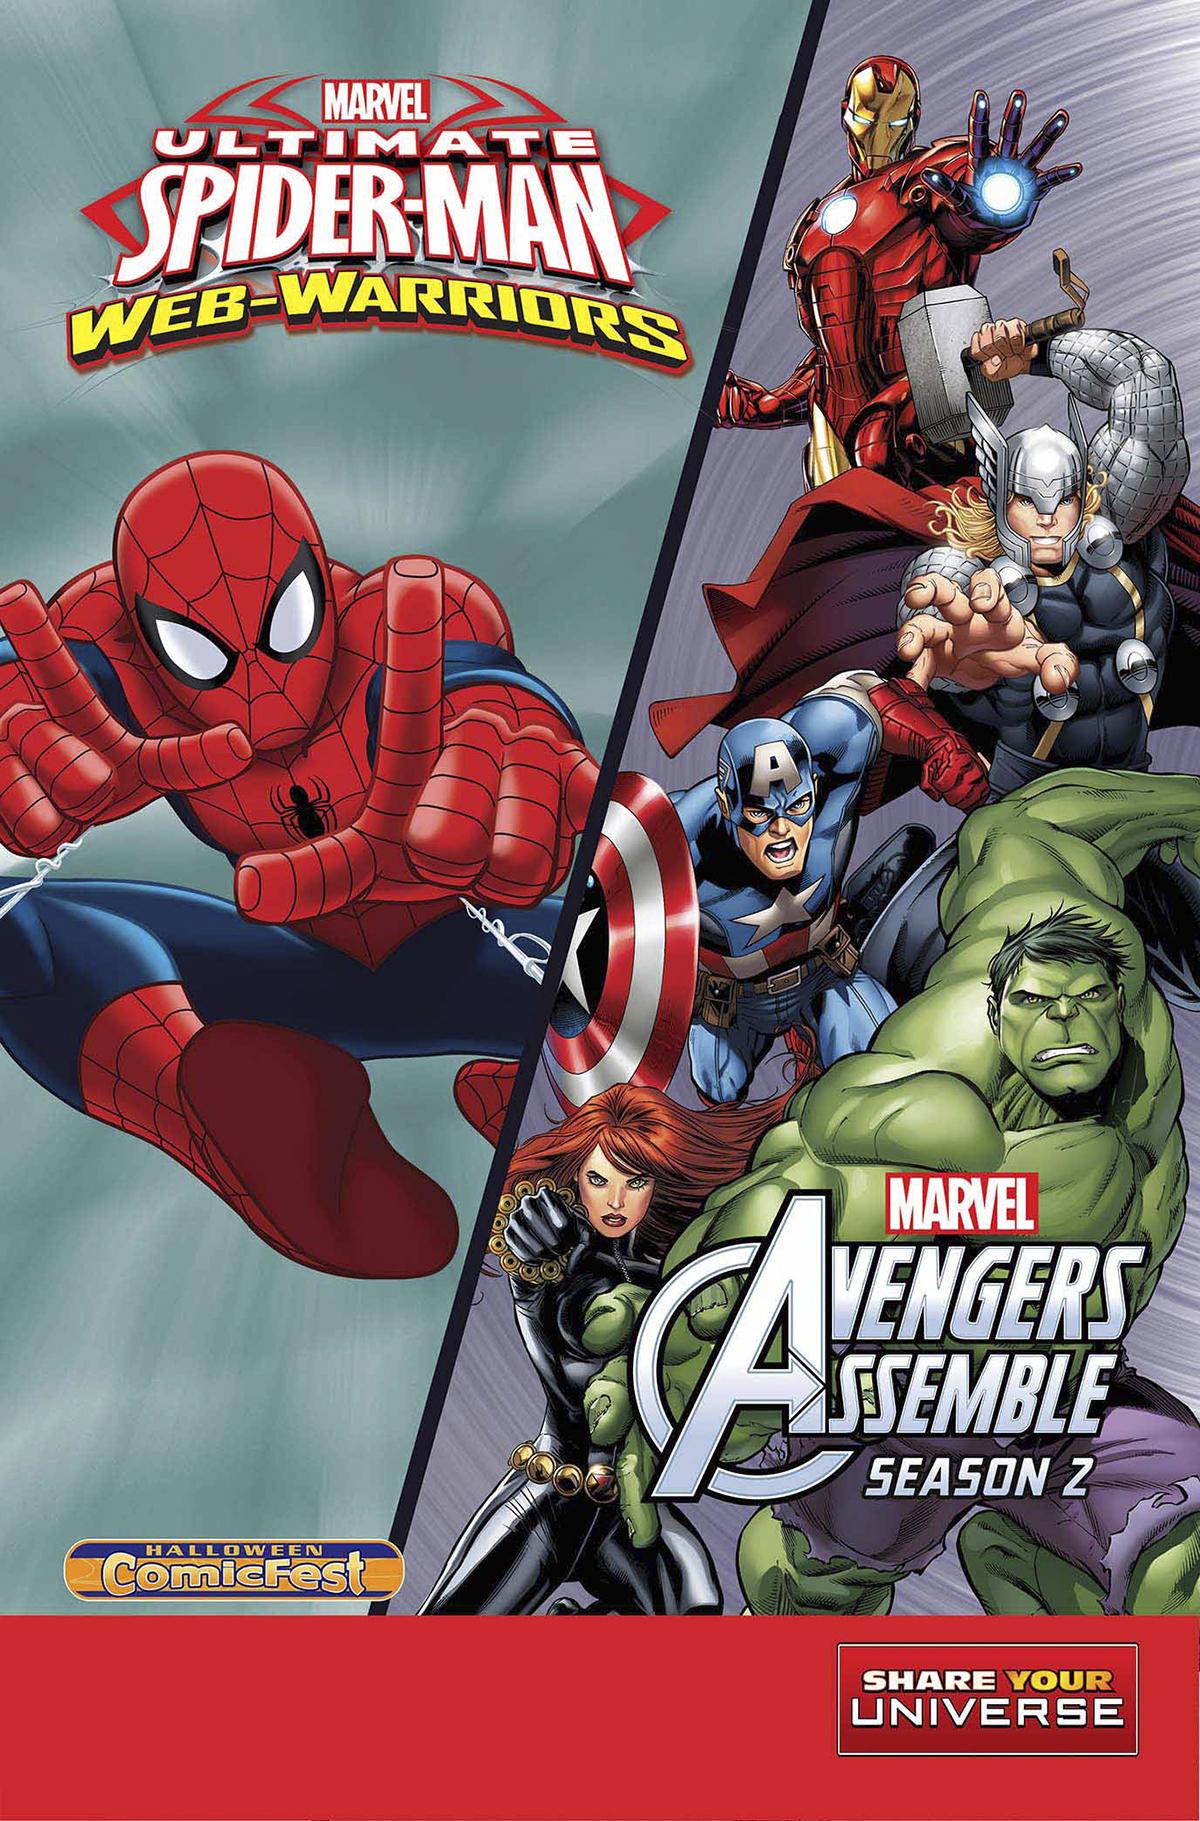 Halloween ComicFest Vol 2015 Ultimate Spider-Man Avengers Assemble